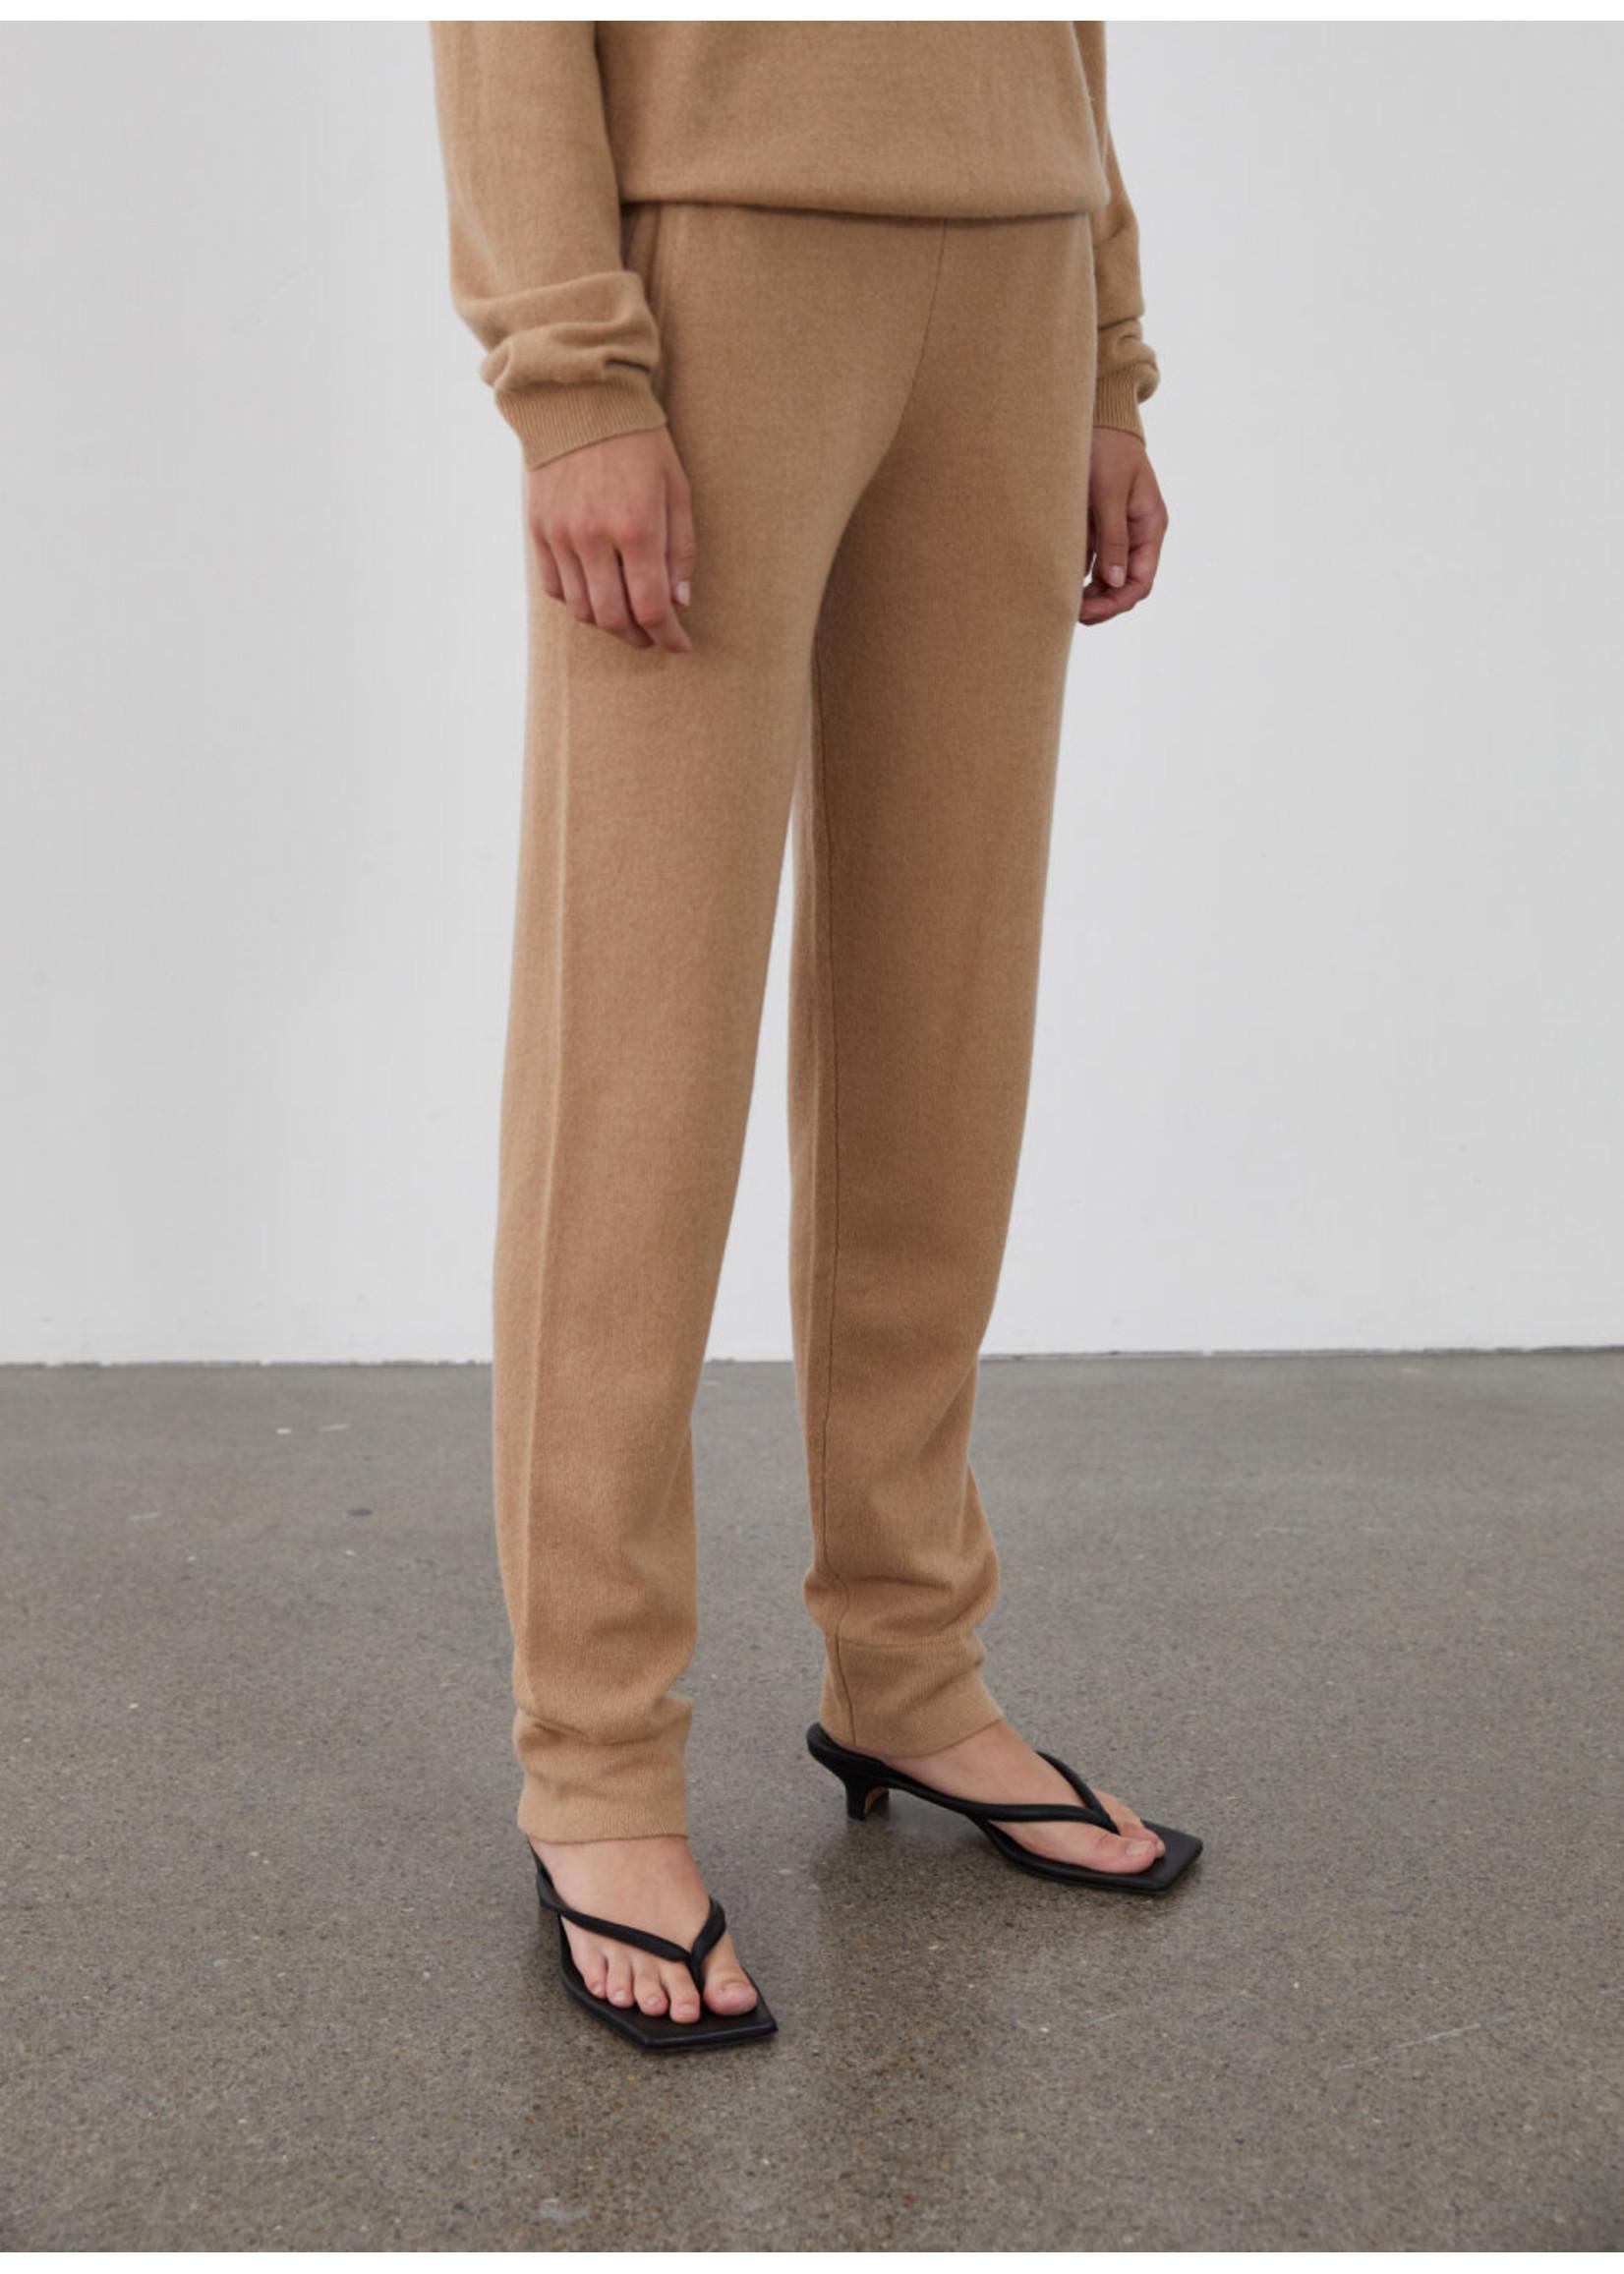 People's Republic of Cashmere Original Sweatpants Camel